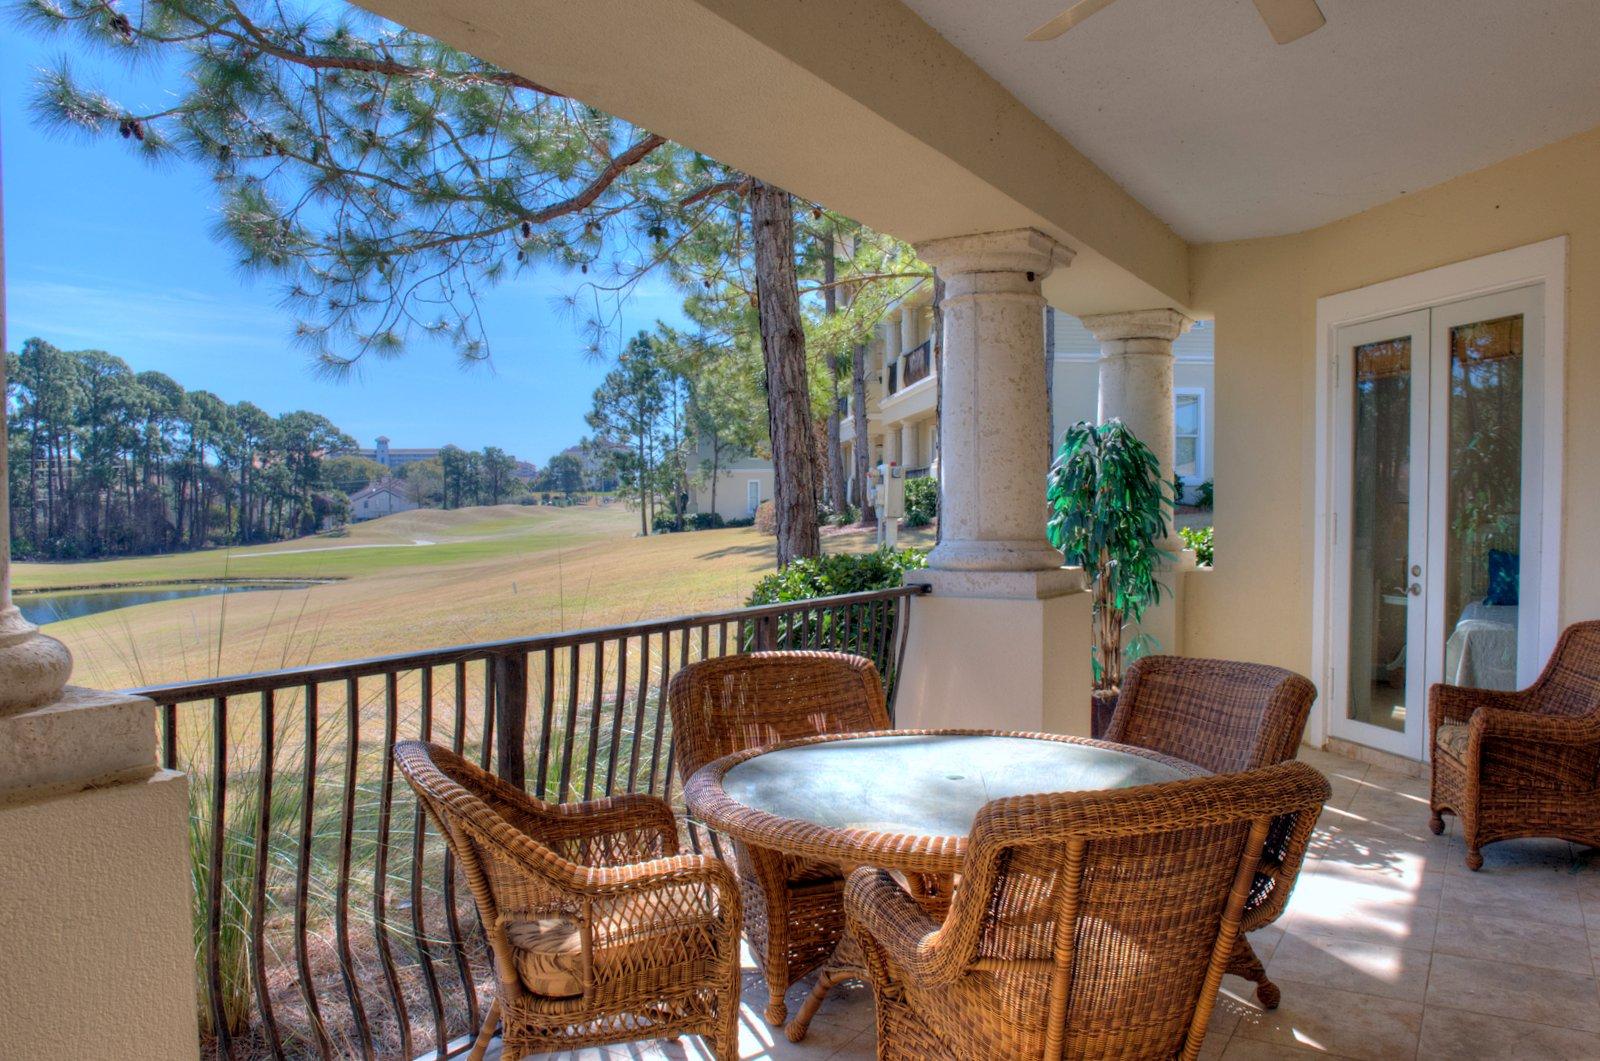 5382 Pine Ridge Condo rental in Sandestin Rentals ~ Cottages and Villas  in Destin Florida - #1